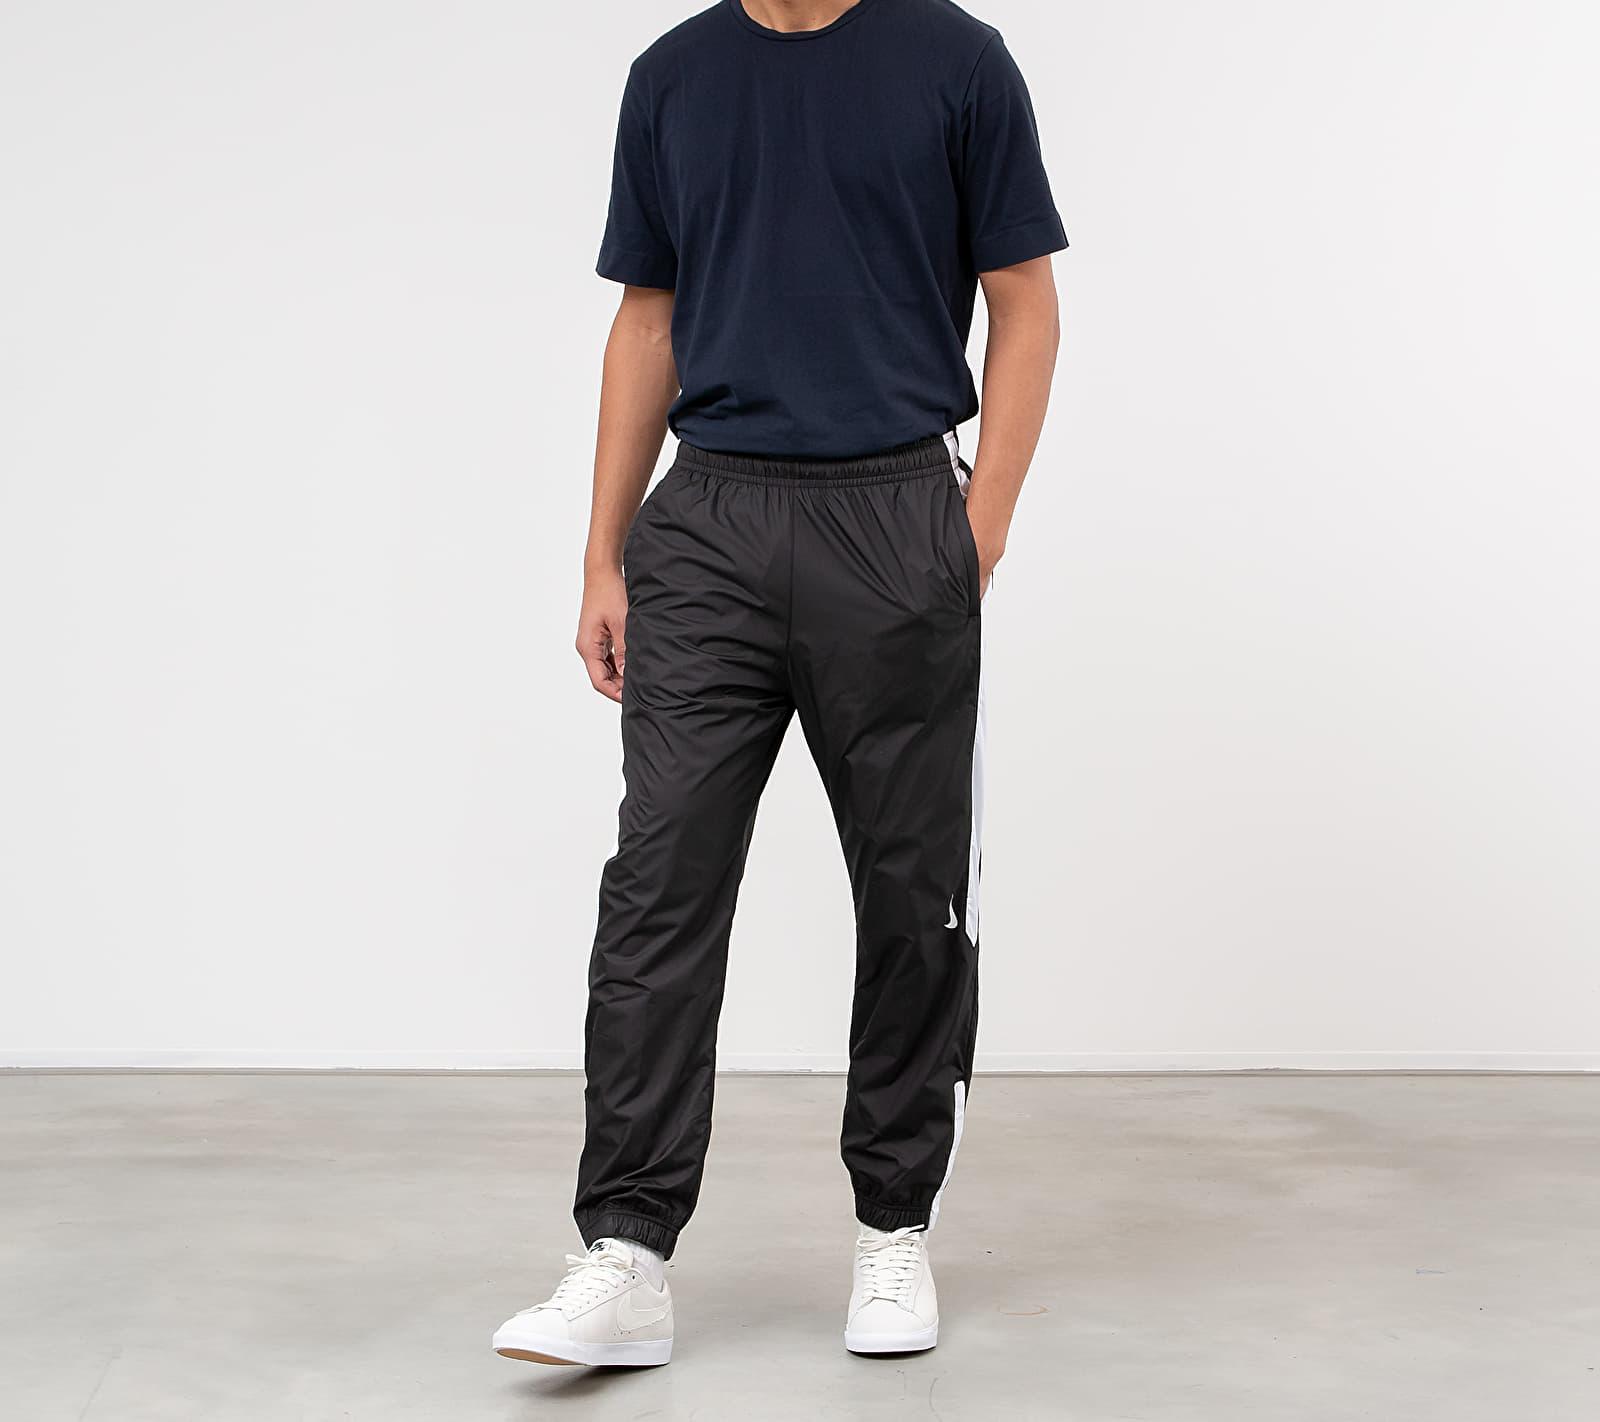 Nike SB Shield Skate Track Pants Black/ White